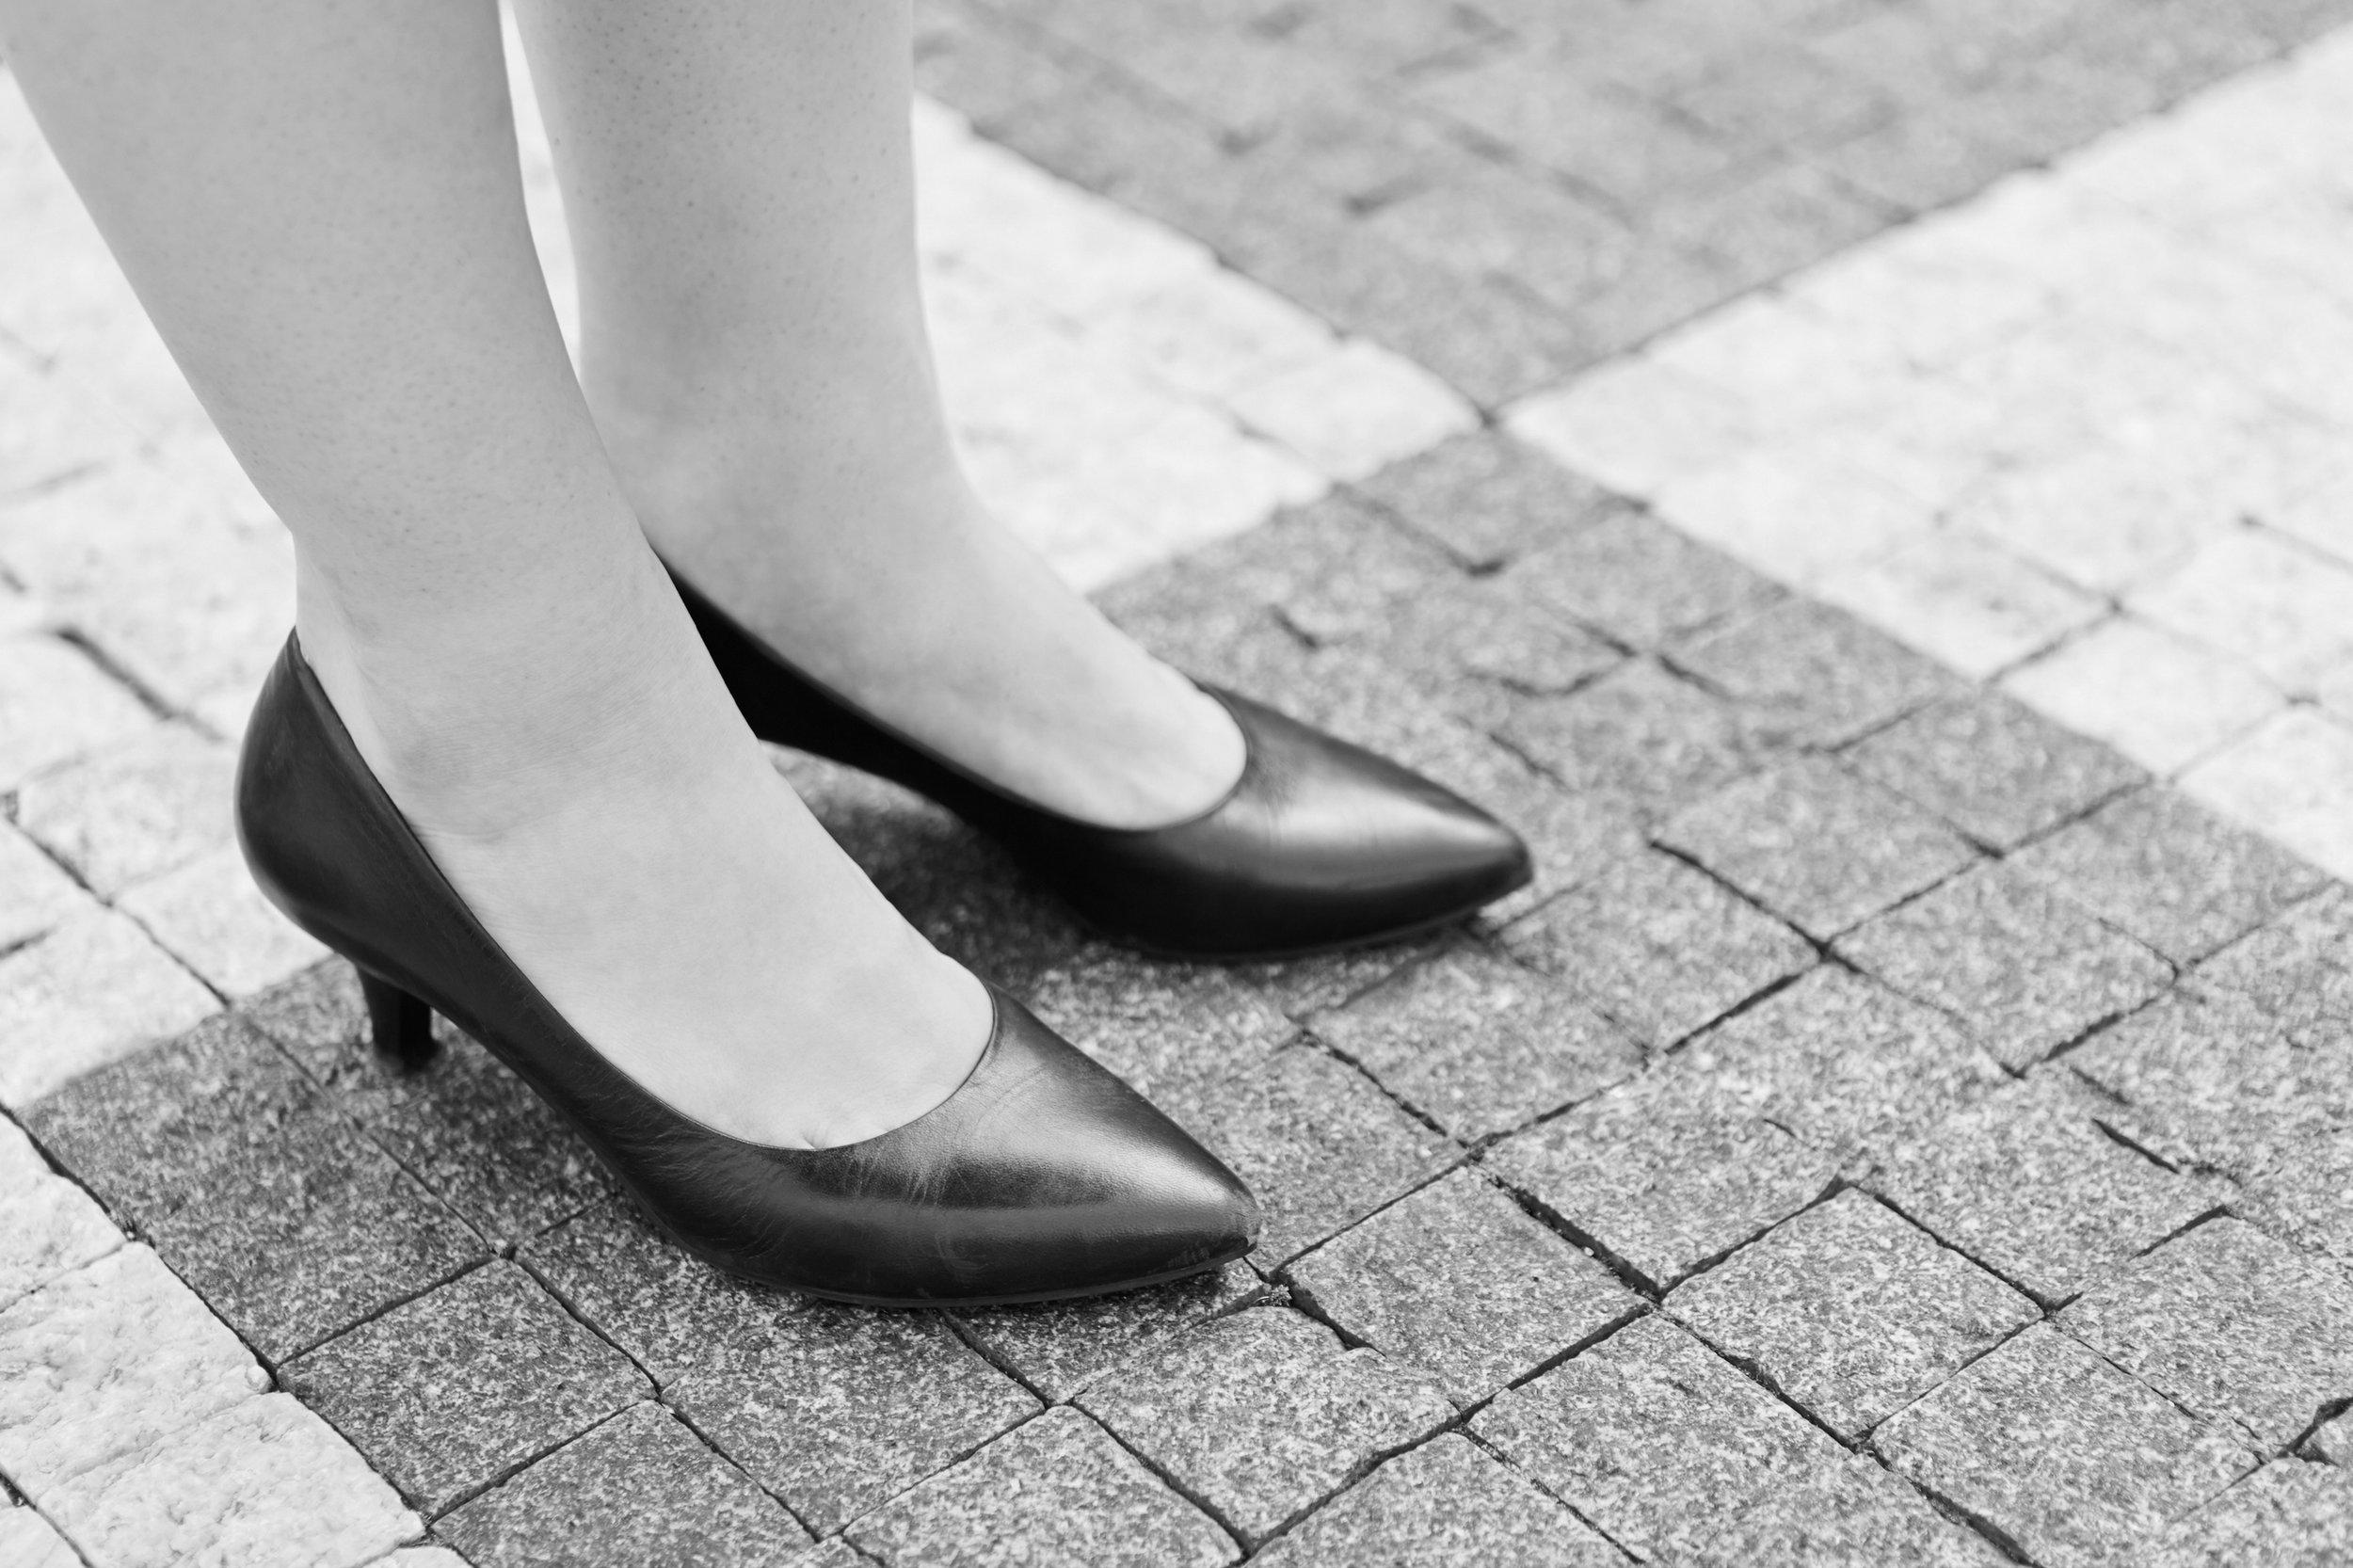 shoes-pavement-bw.jpg